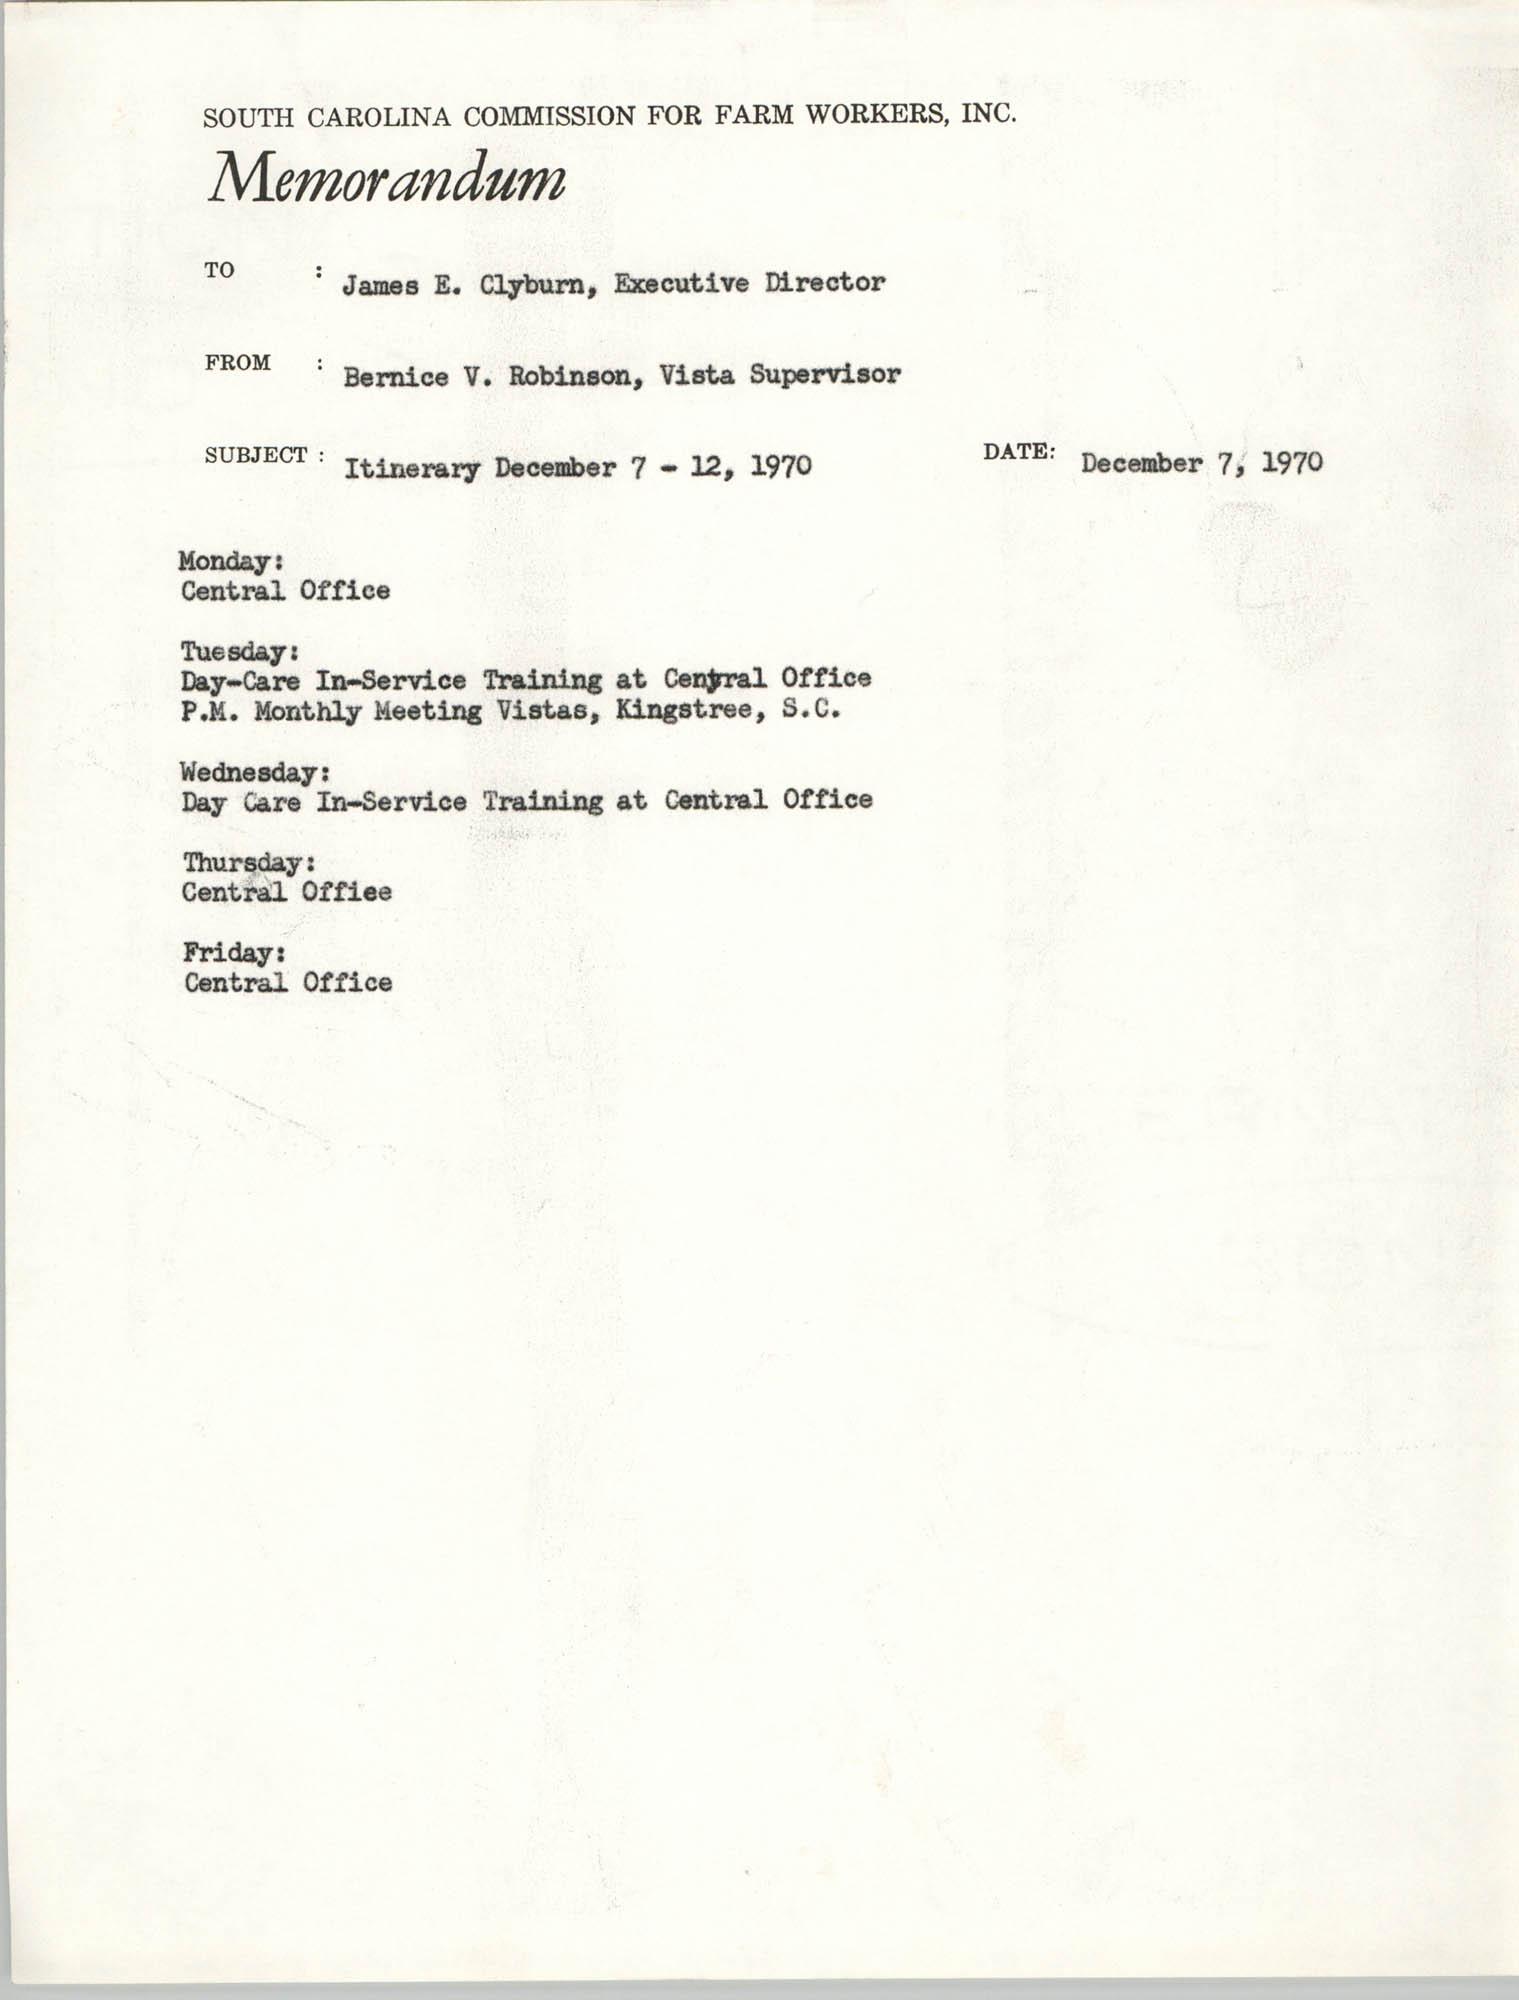 Memorandum from Bernice V. Robinson to James E. Clyburn, December 7, 1970